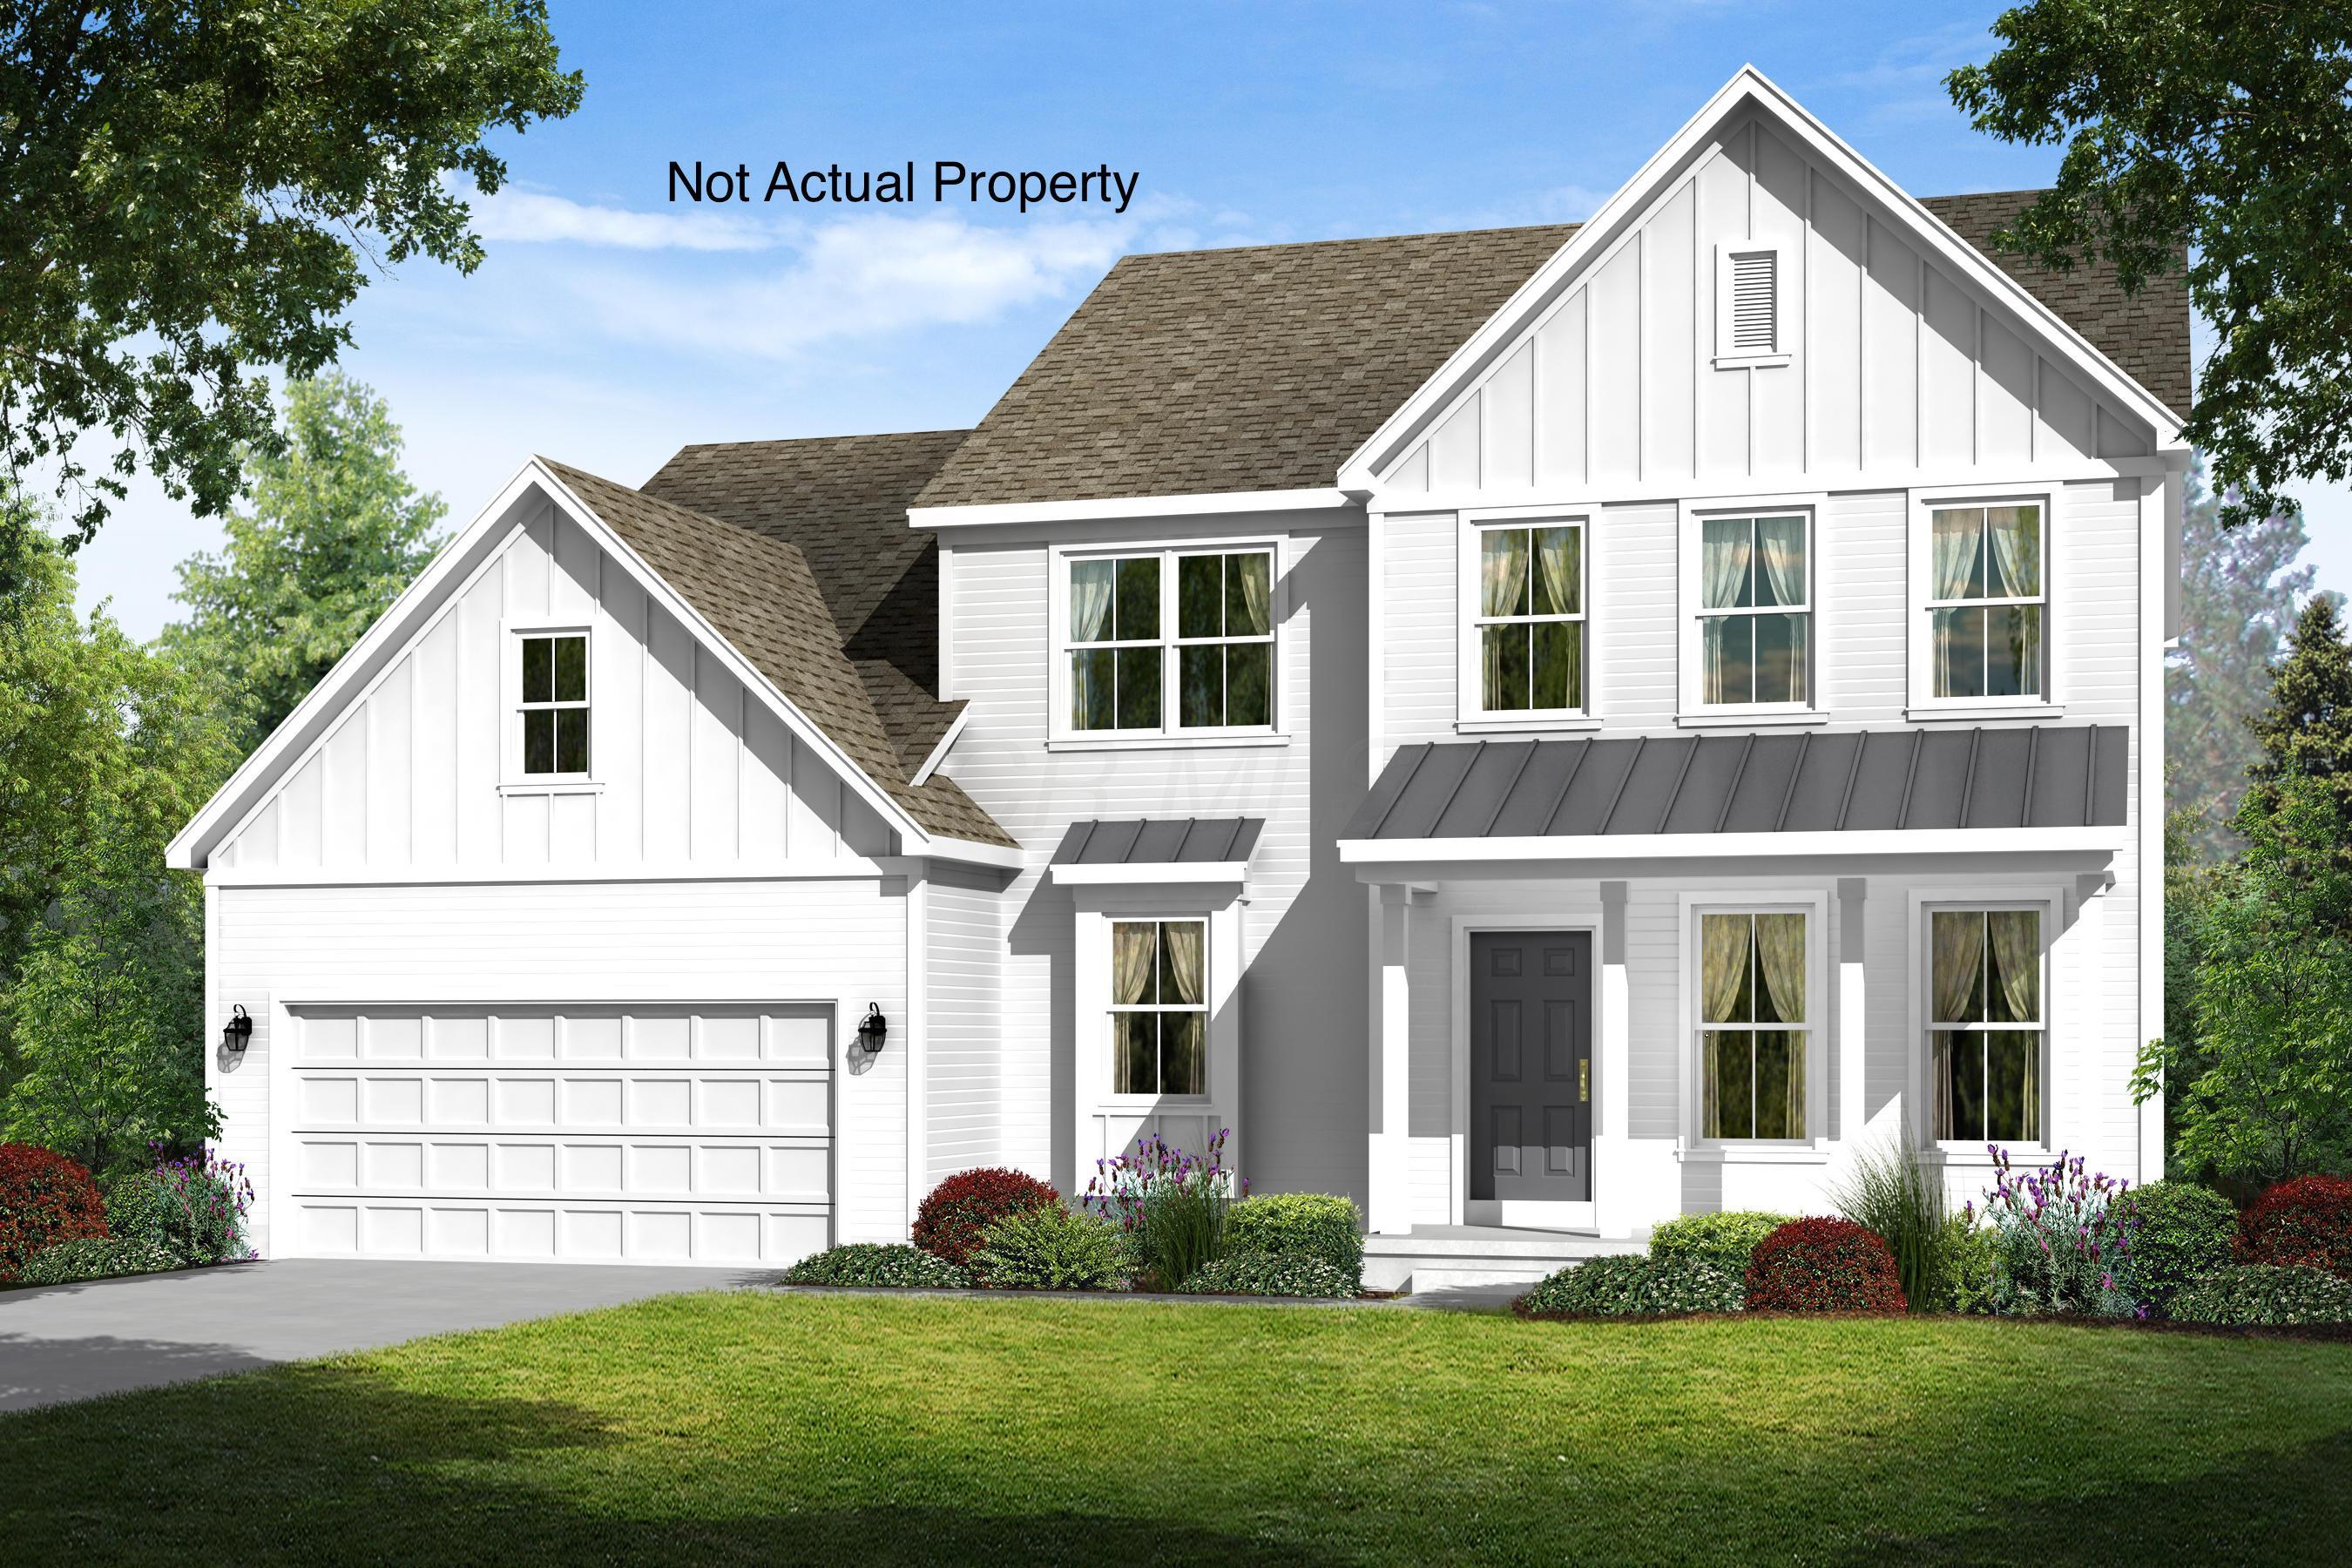 2315 Gingerfield Way, Sunbury, Ohio 43074, 4 Bedrooms Bedrooms, ,3 BathroomsBathrooms,Residential,For Sale,Gingerfield,220019000